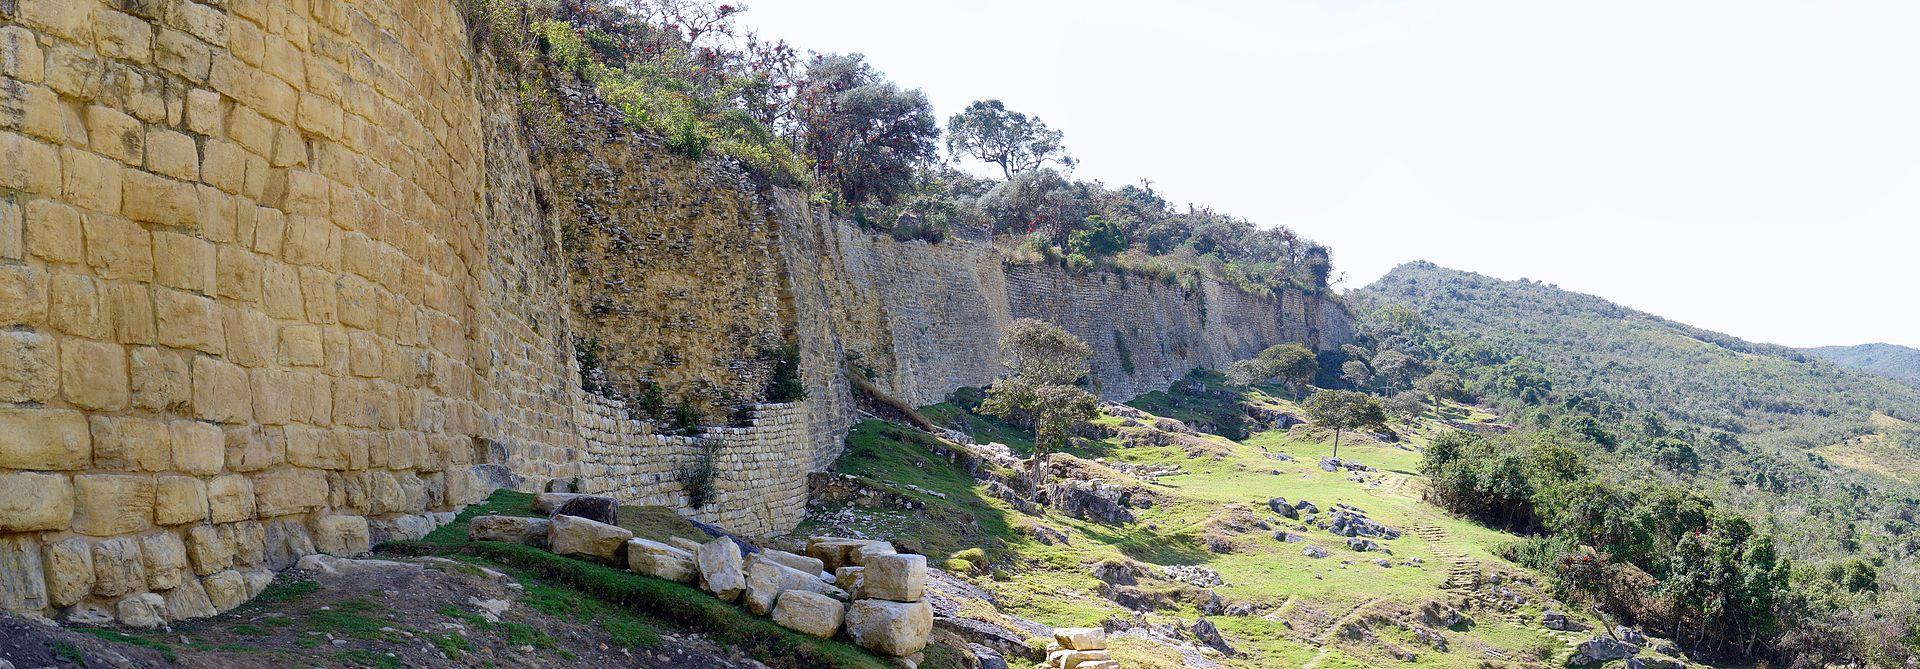 Head north for some more great hiking in Peru, like the Gran Vilaya Trek.